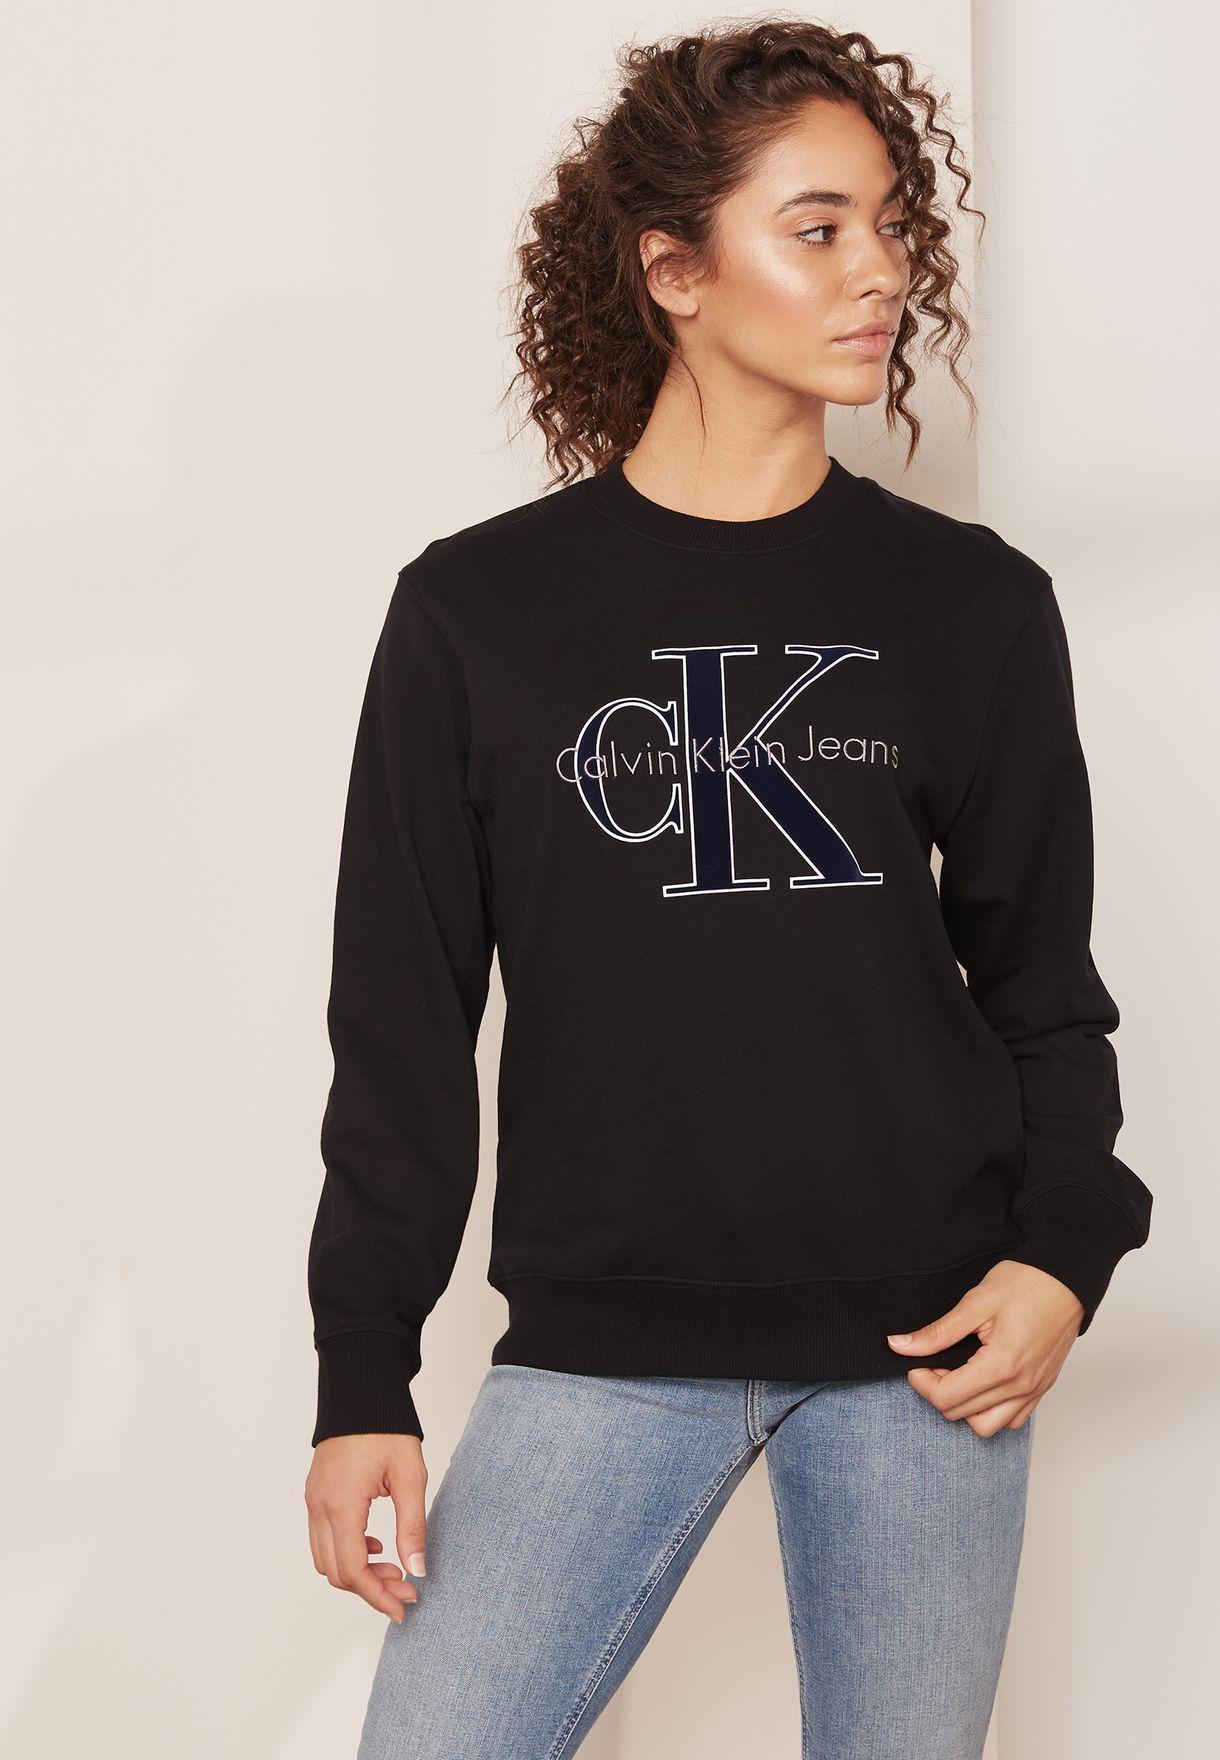 c1ec030967f Shop Calvin Klein Jeans black Logo Sweatshirt J20J206980 for Women ...